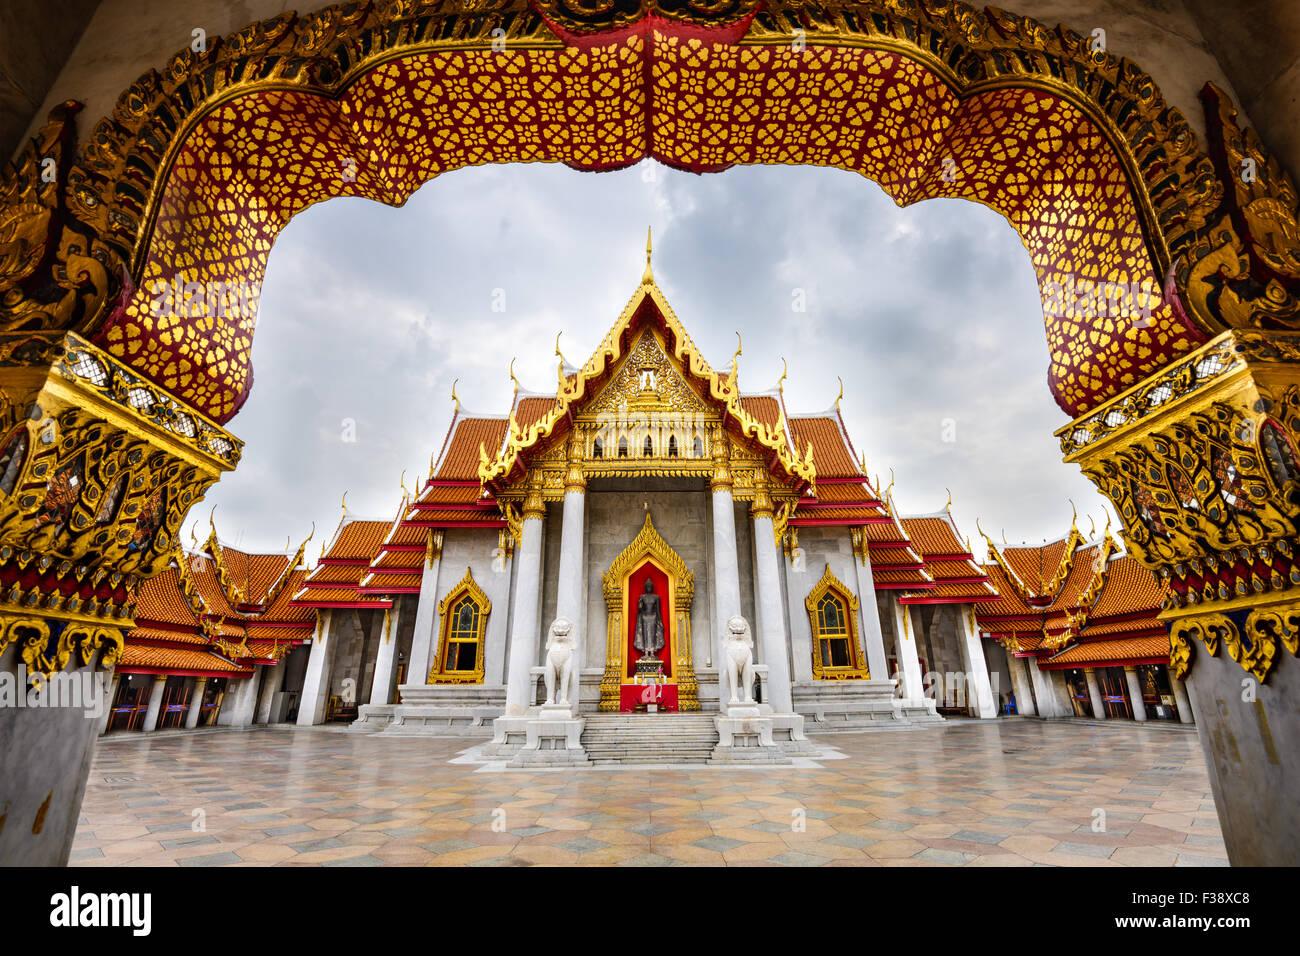 Il Wat Benchamabophit, il tempio in marmo, a Bangkok, in Thailandia. Immagini Stock